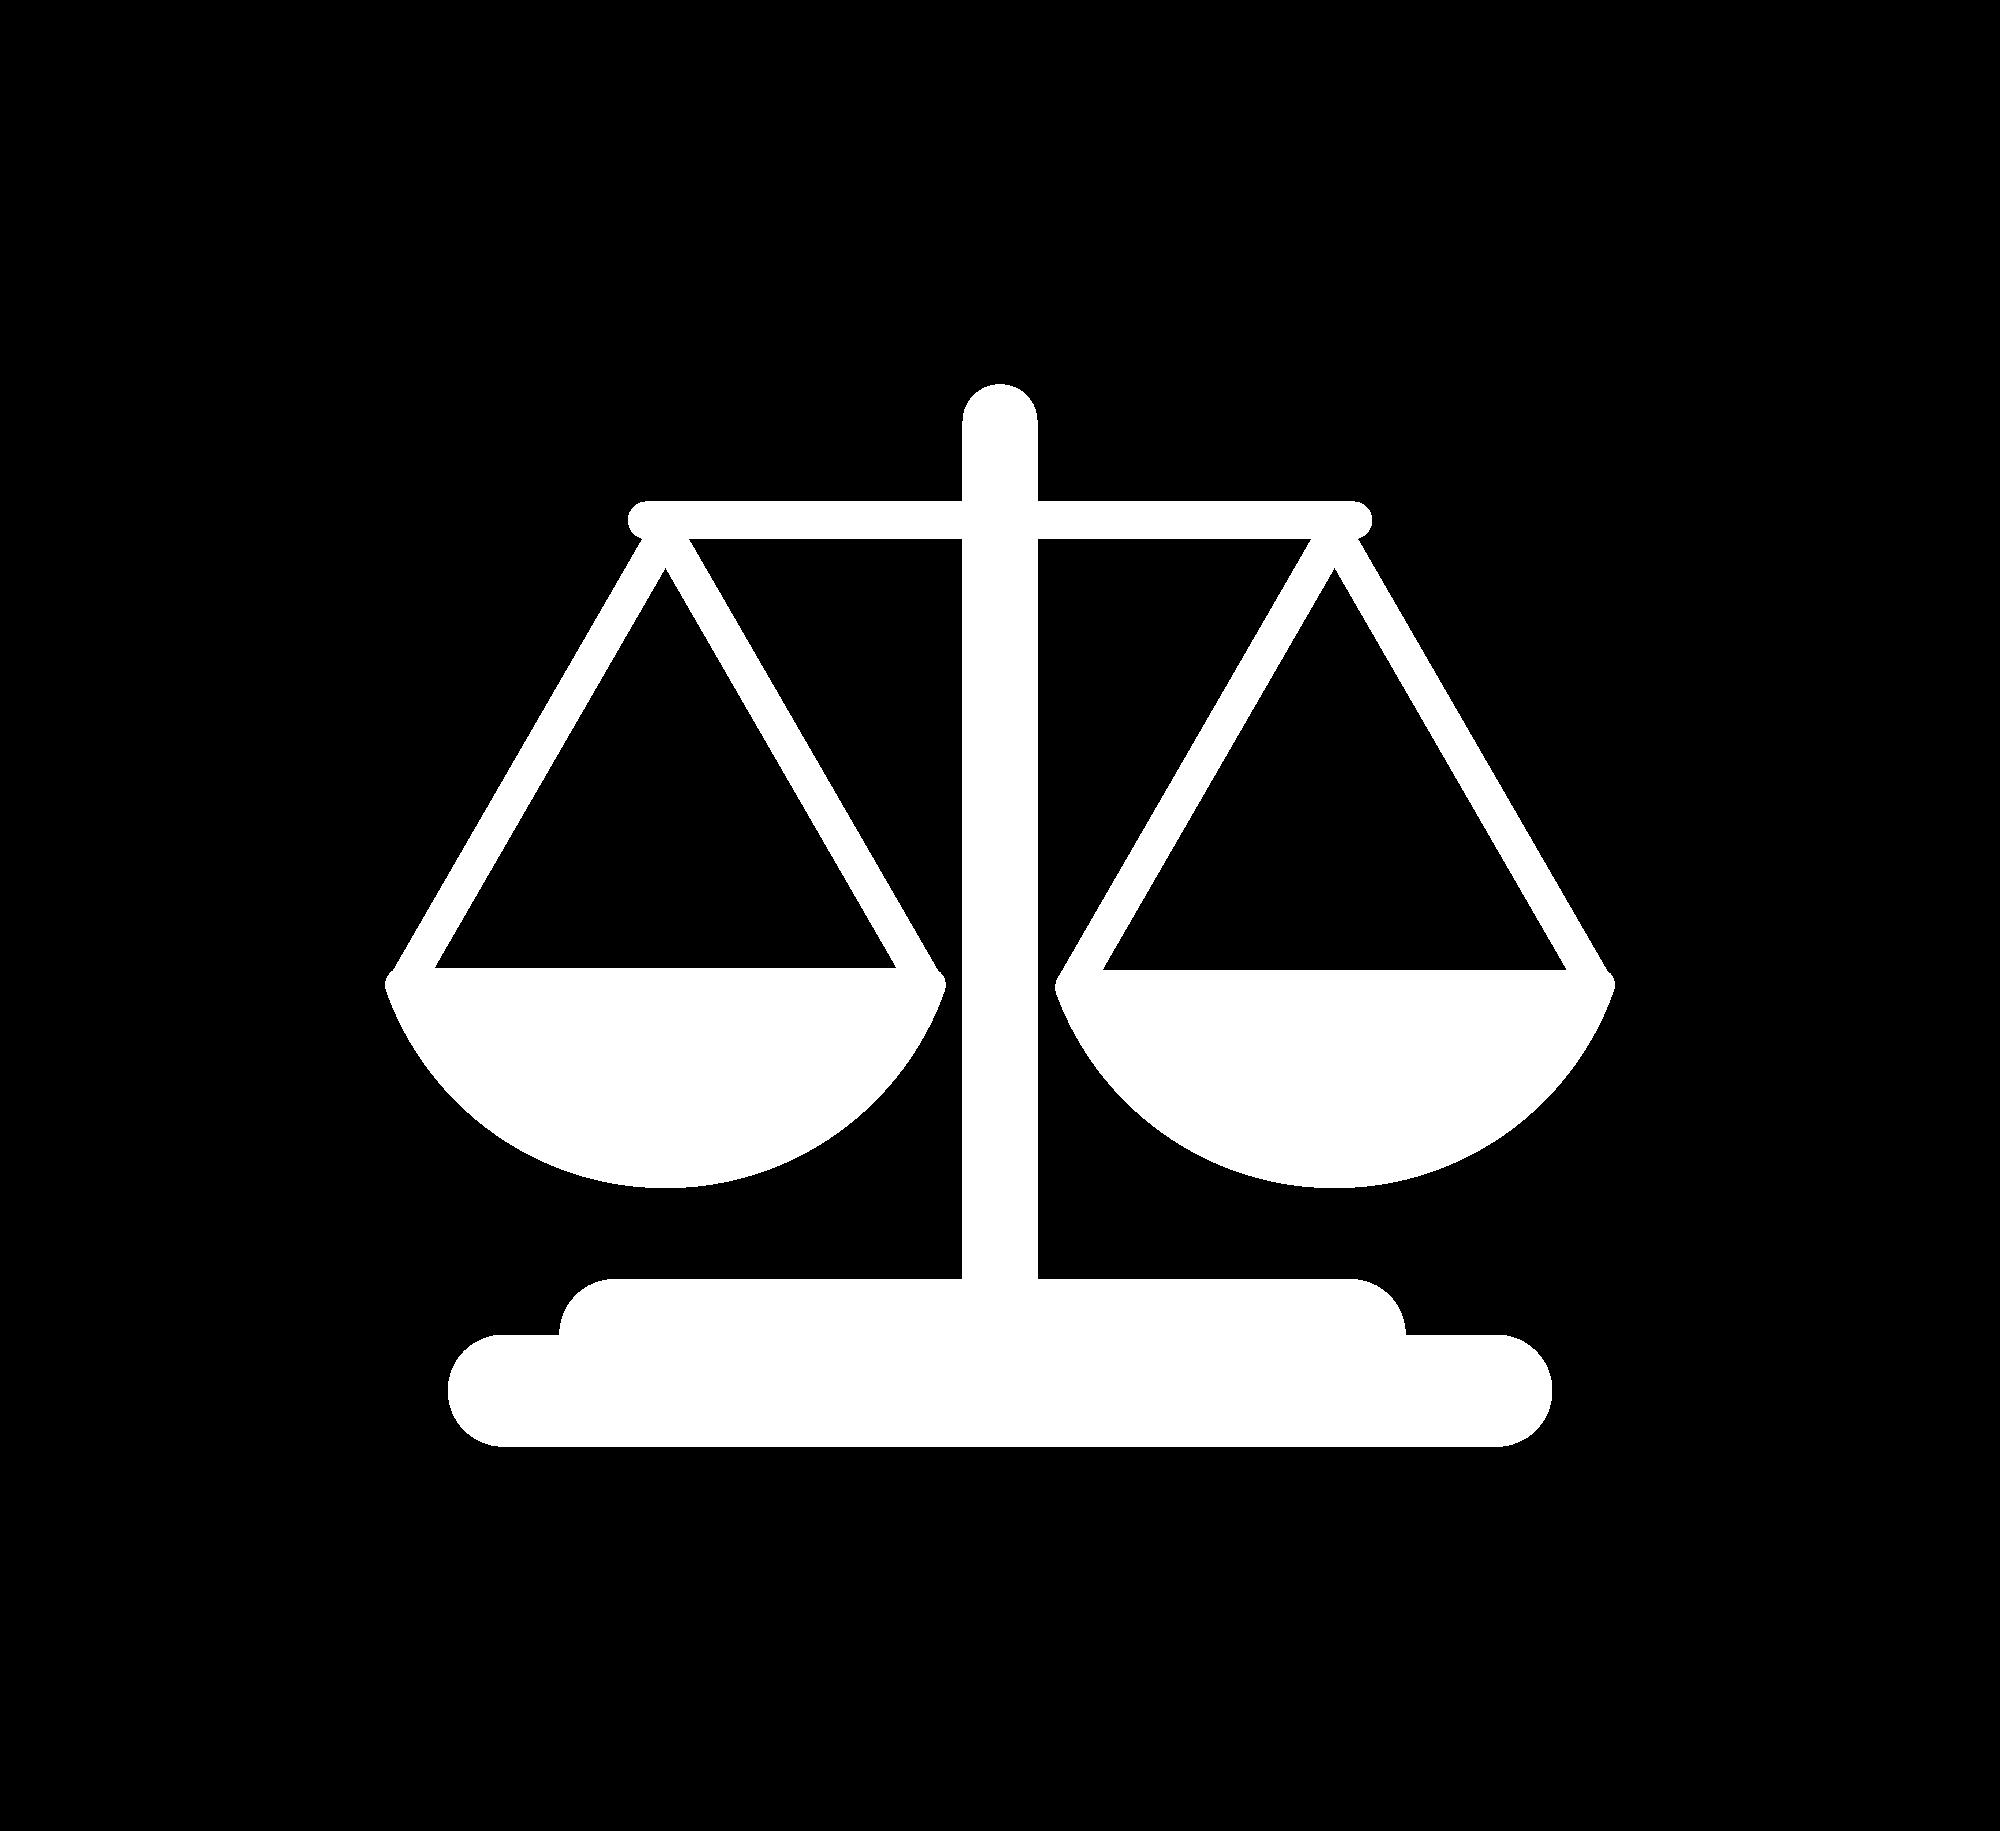 logo-white (8).png